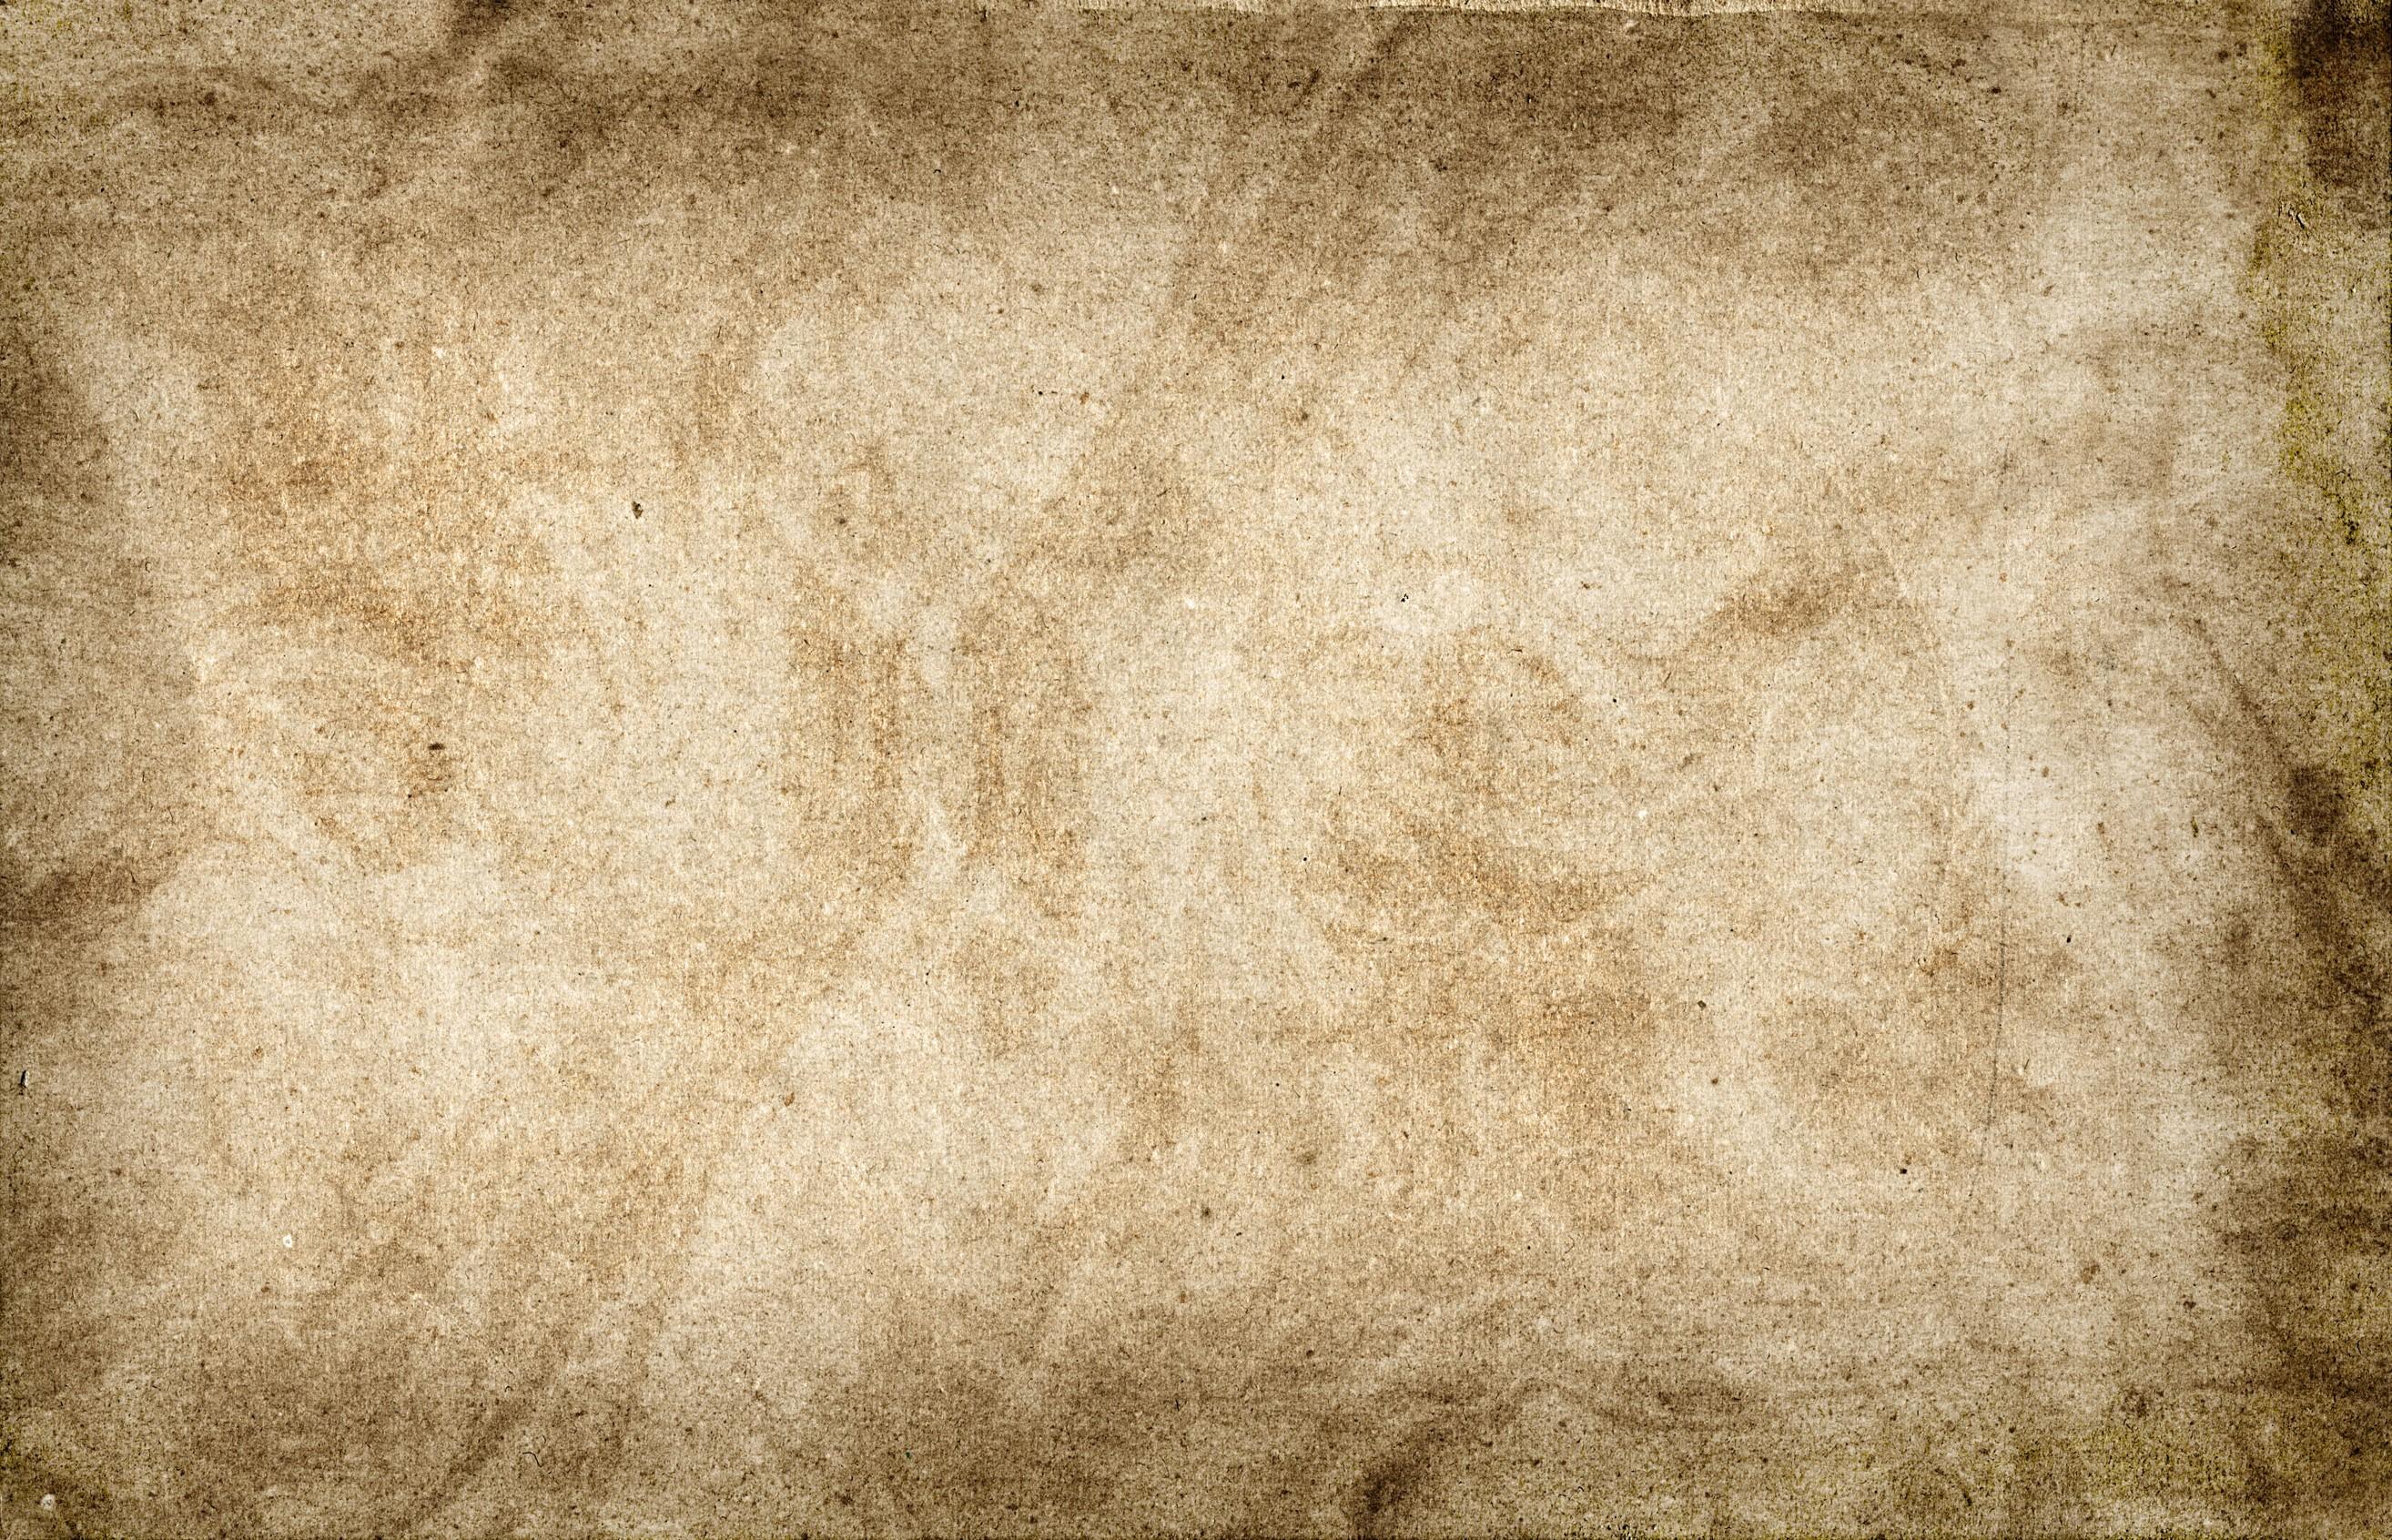 Rough Texture Background: Free Photo: Grunge Background